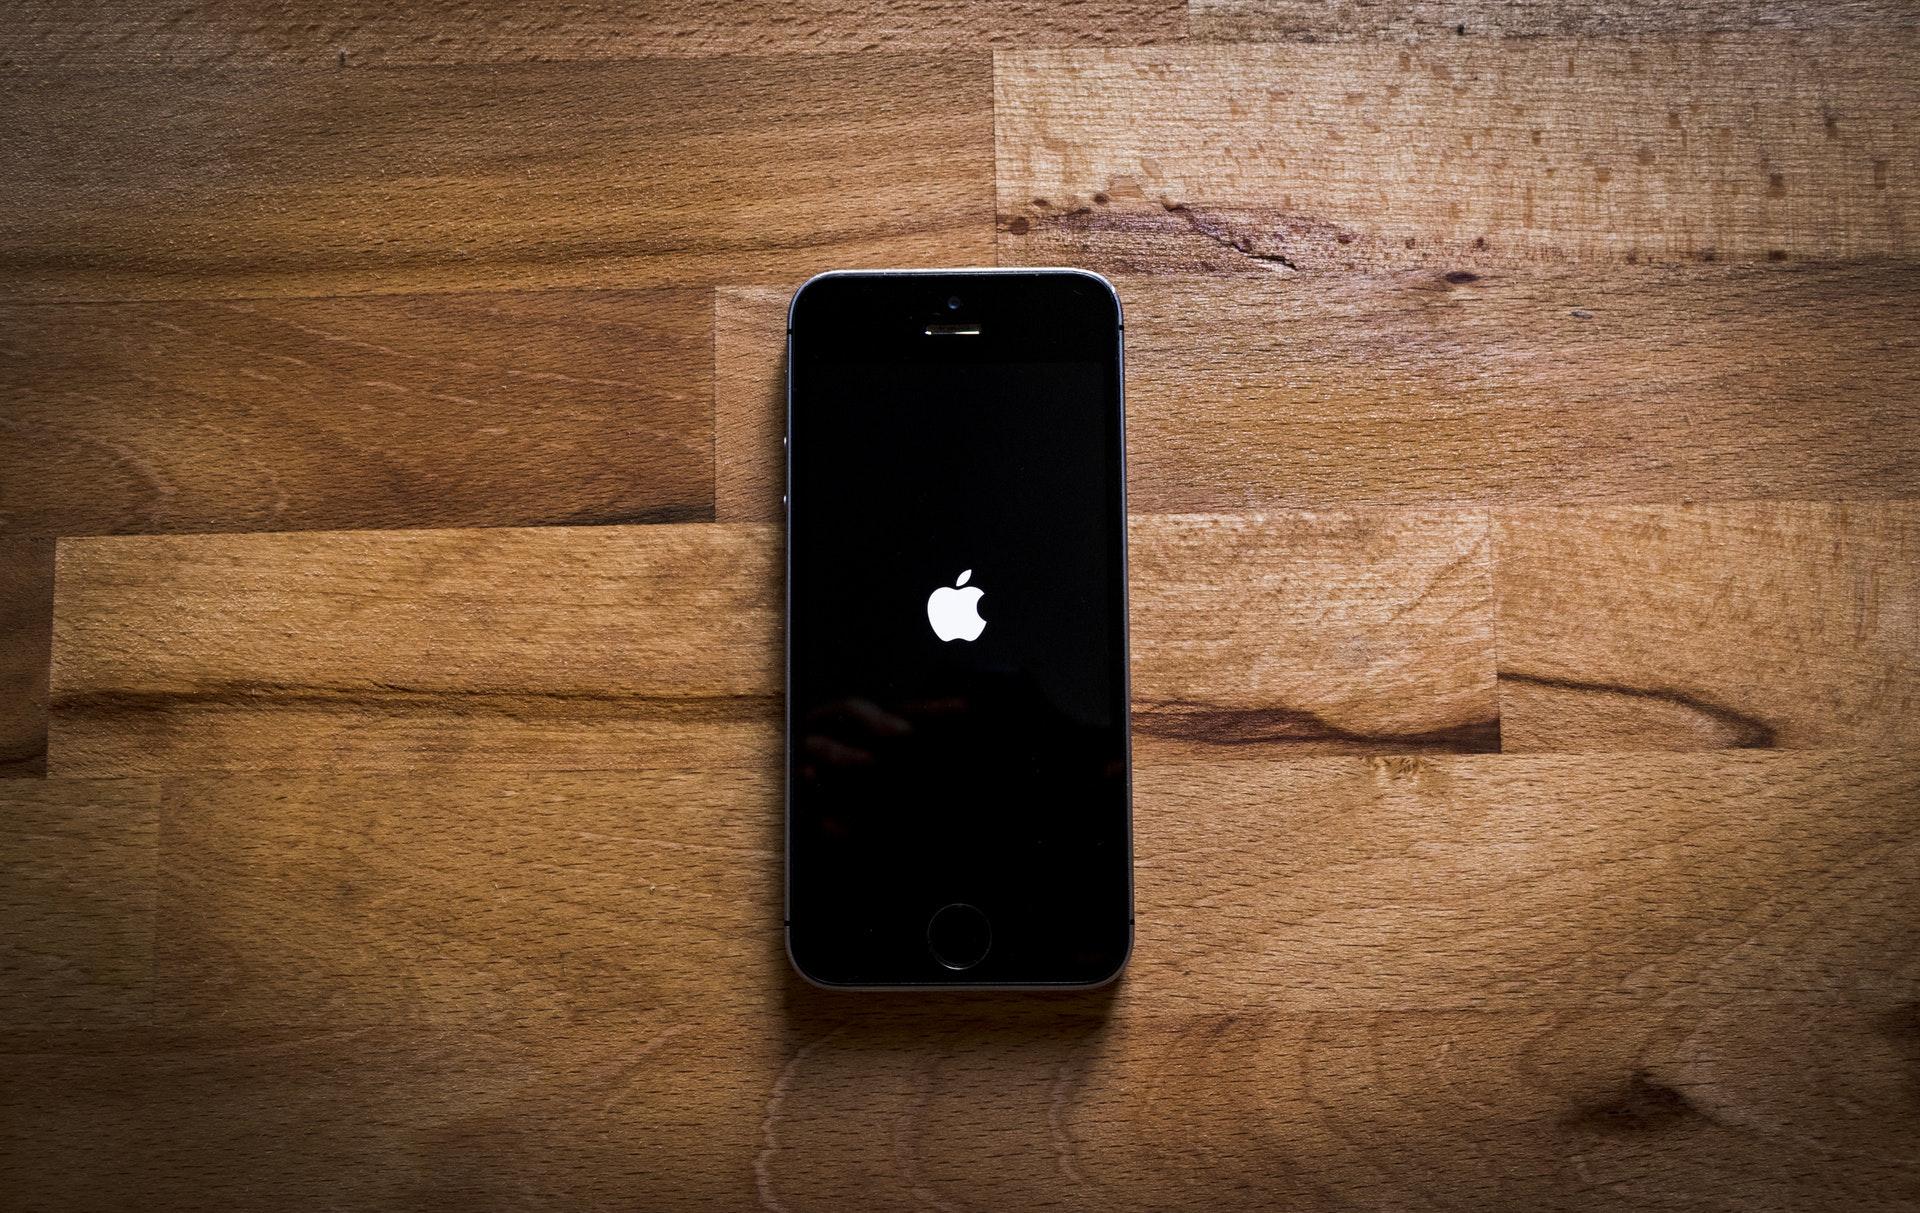 iPhoneの強制終了とは?機種別の強制終了方法まとめ